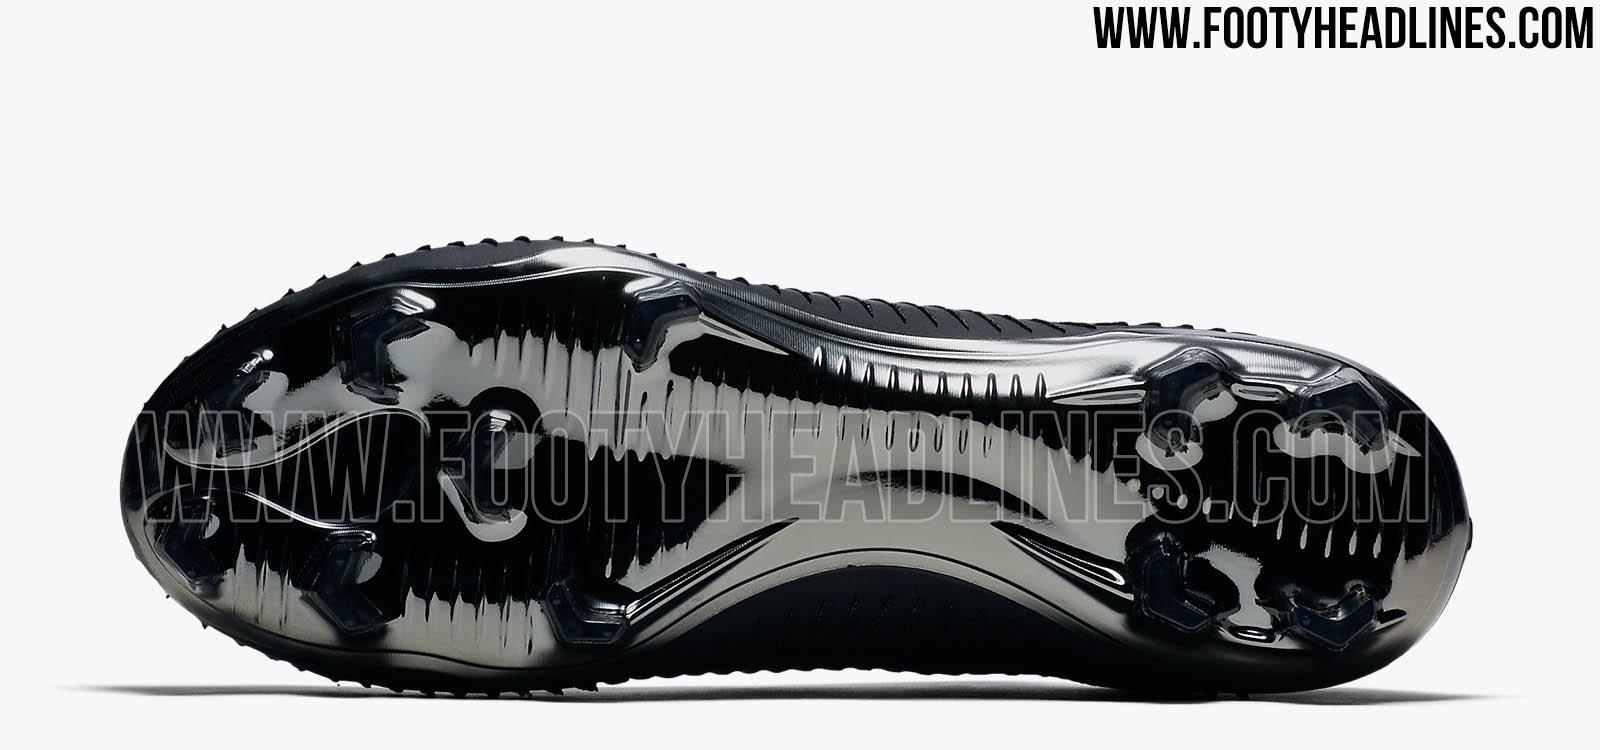 ba63c951e37 All-New Black   Silver Metallic Nike Flyknit Ultra Football Boot ...